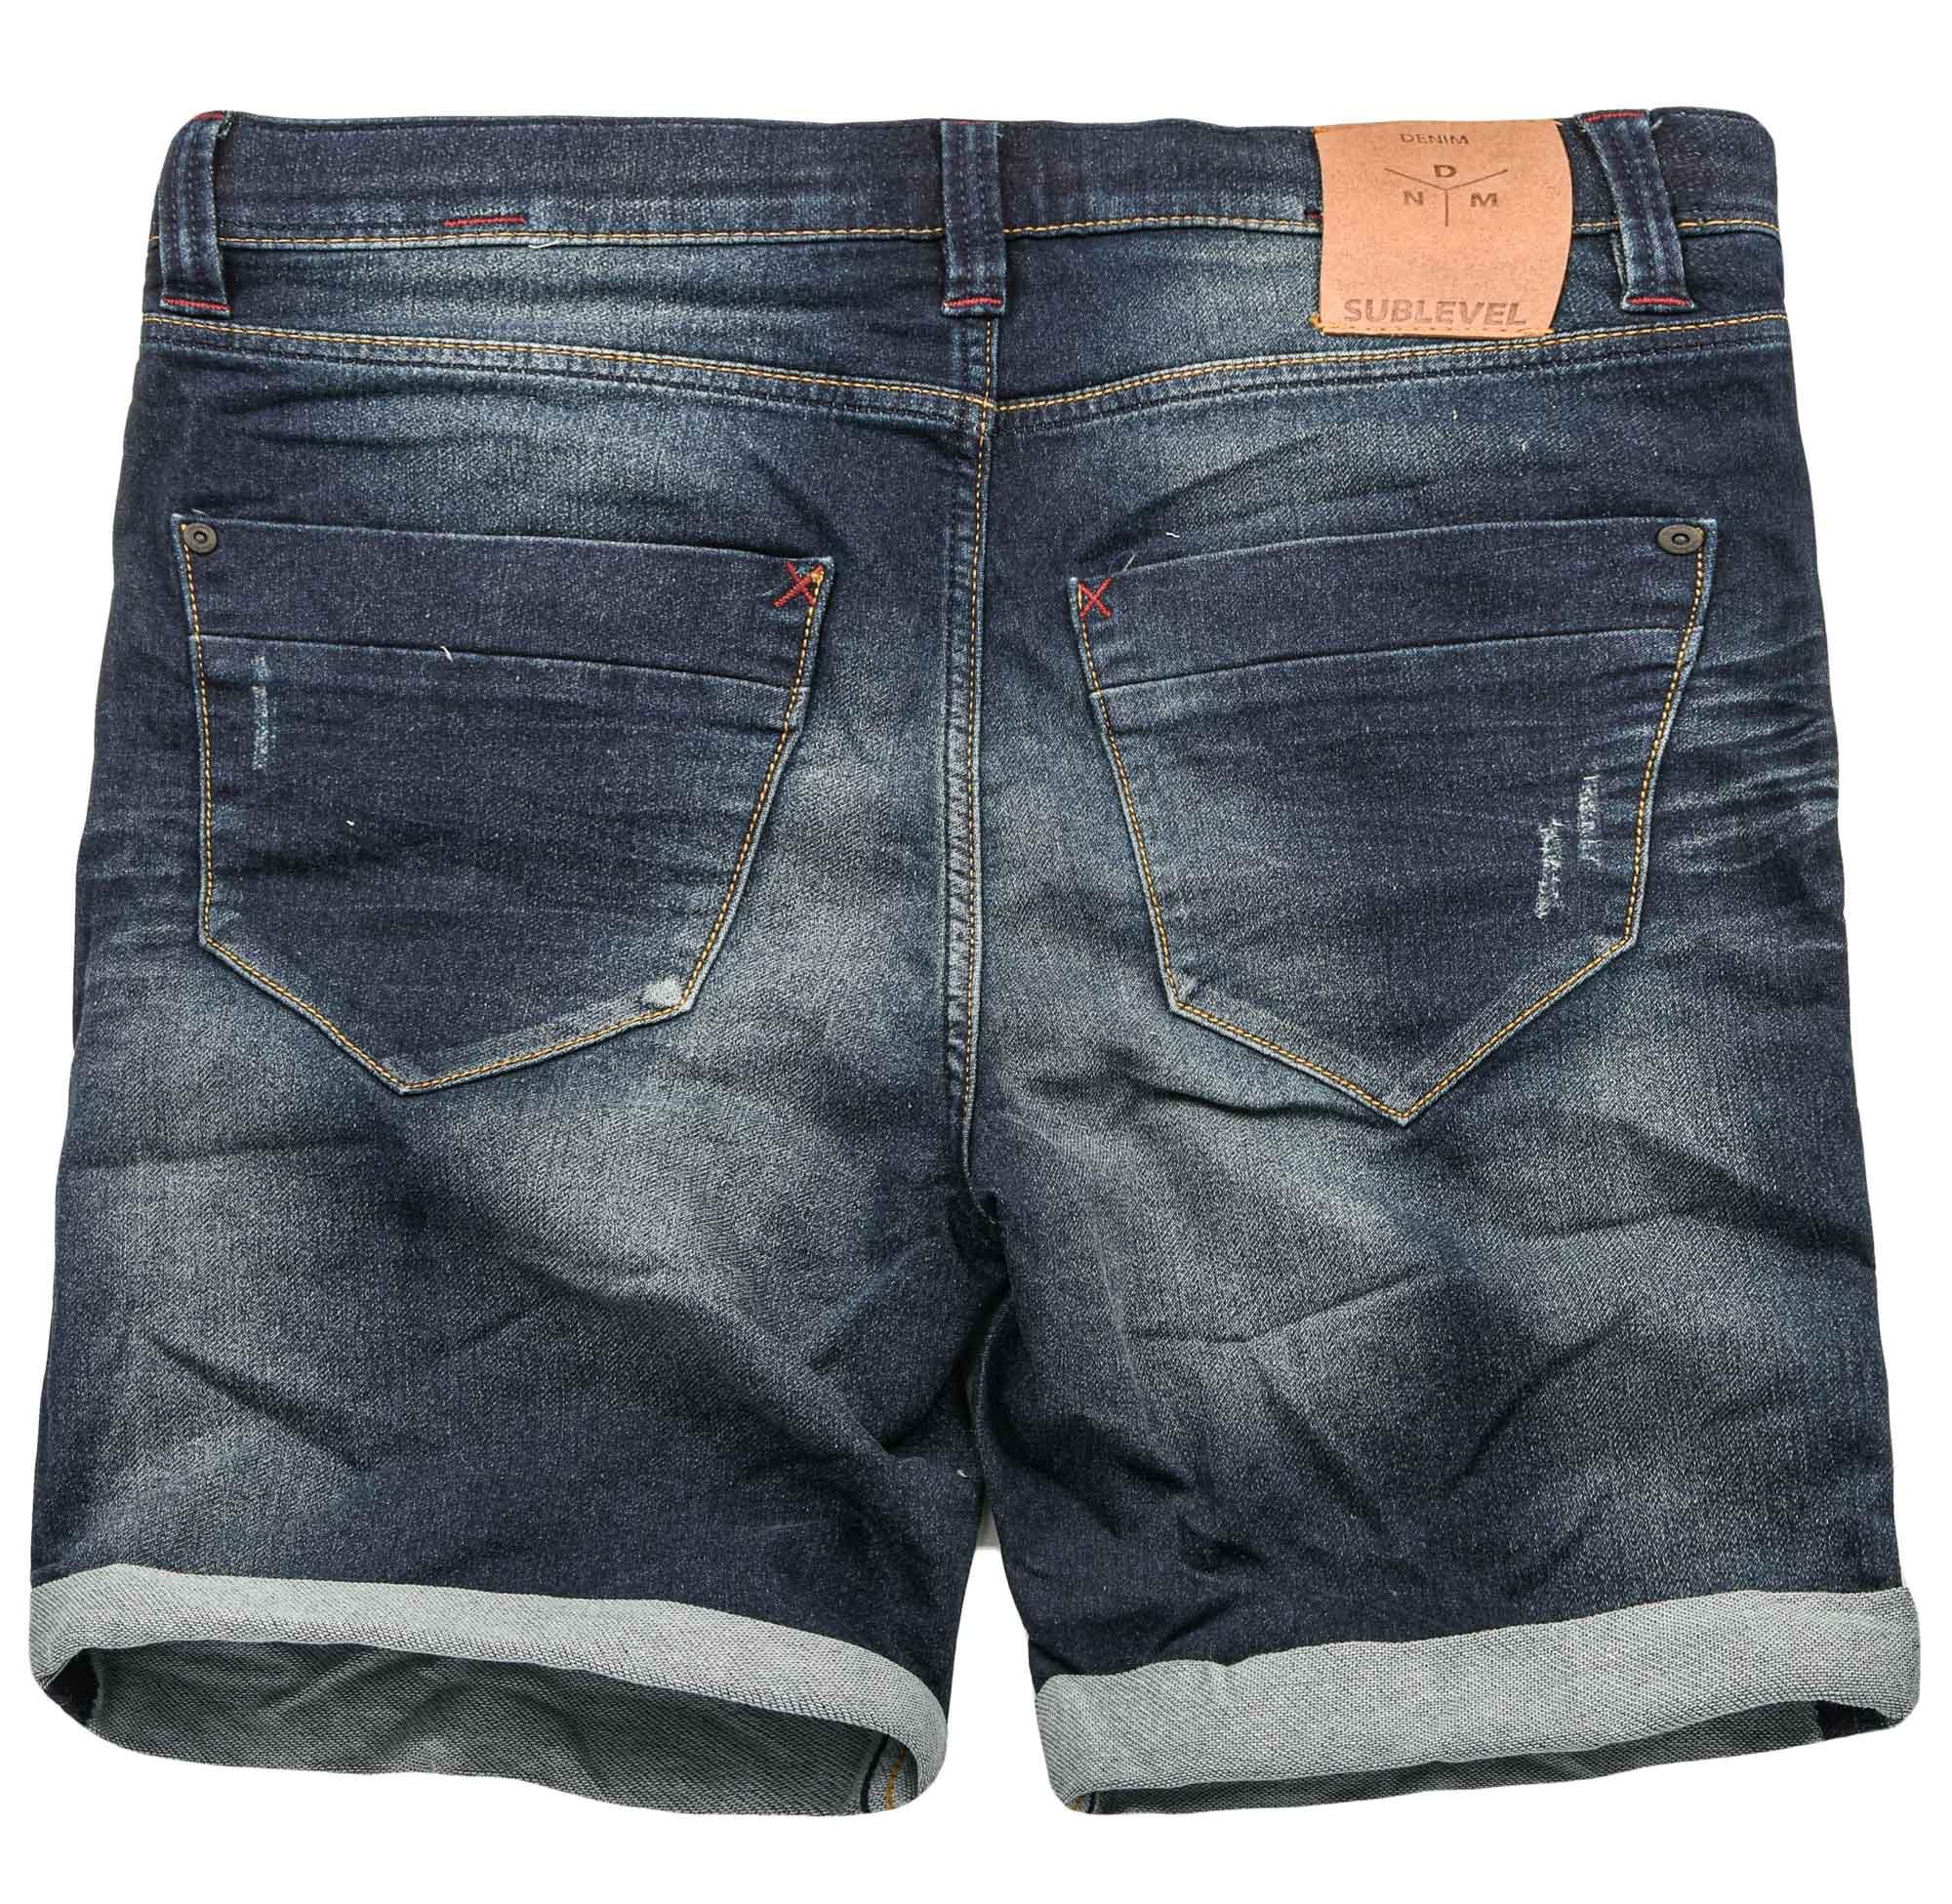 Sublevel-Herren-Sweat-Jeans-Shorts-kurze-Hose-Bermuda-Sommer-Sweathose-Slim-NEU Indexbild 24